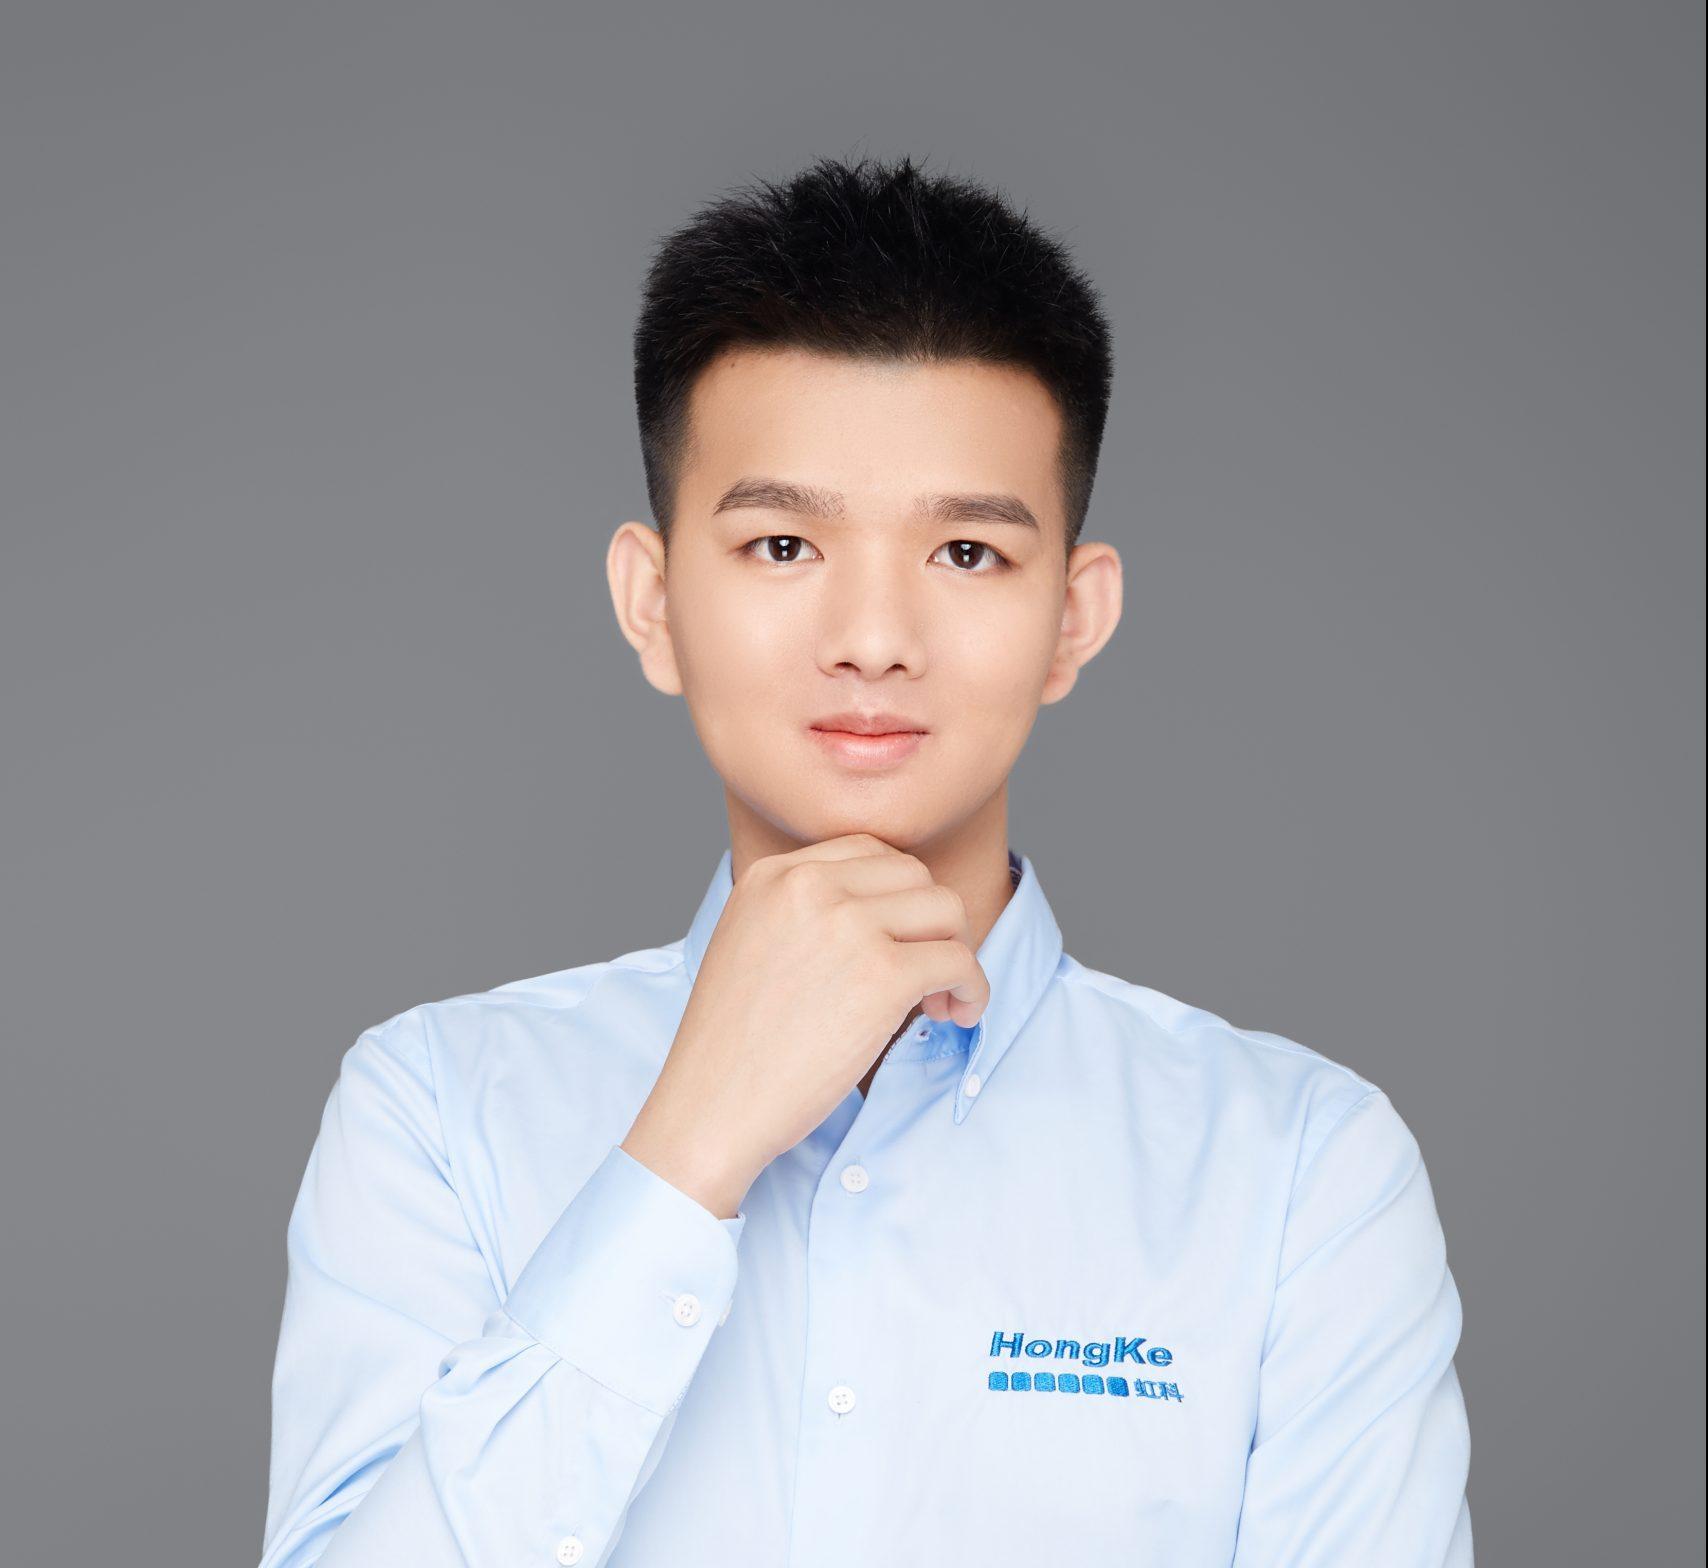 Zach-华南理工大学,2019届